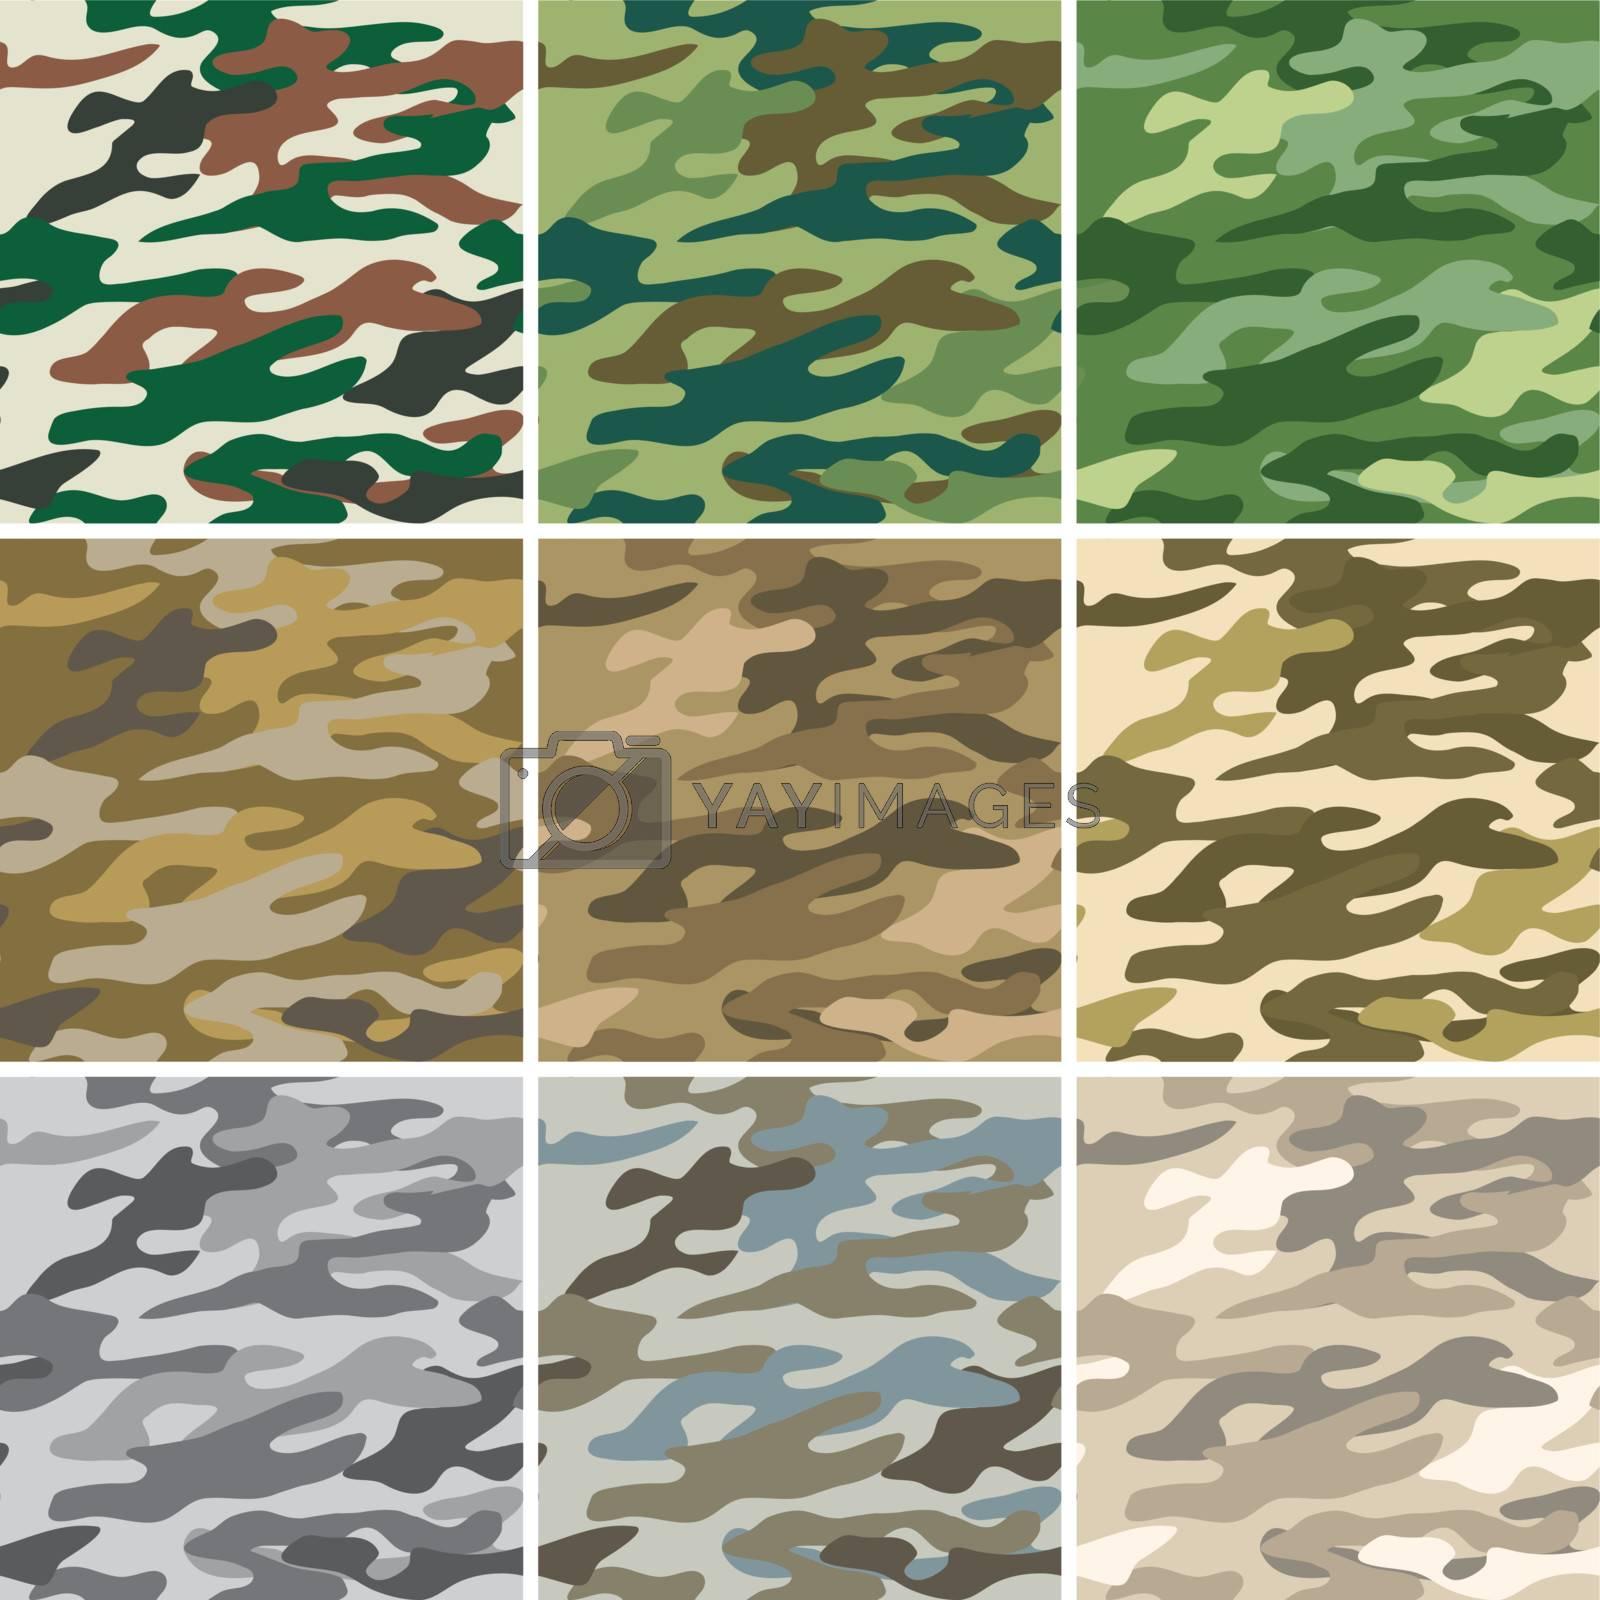 Illustration of digital camouflage seamless patterns.